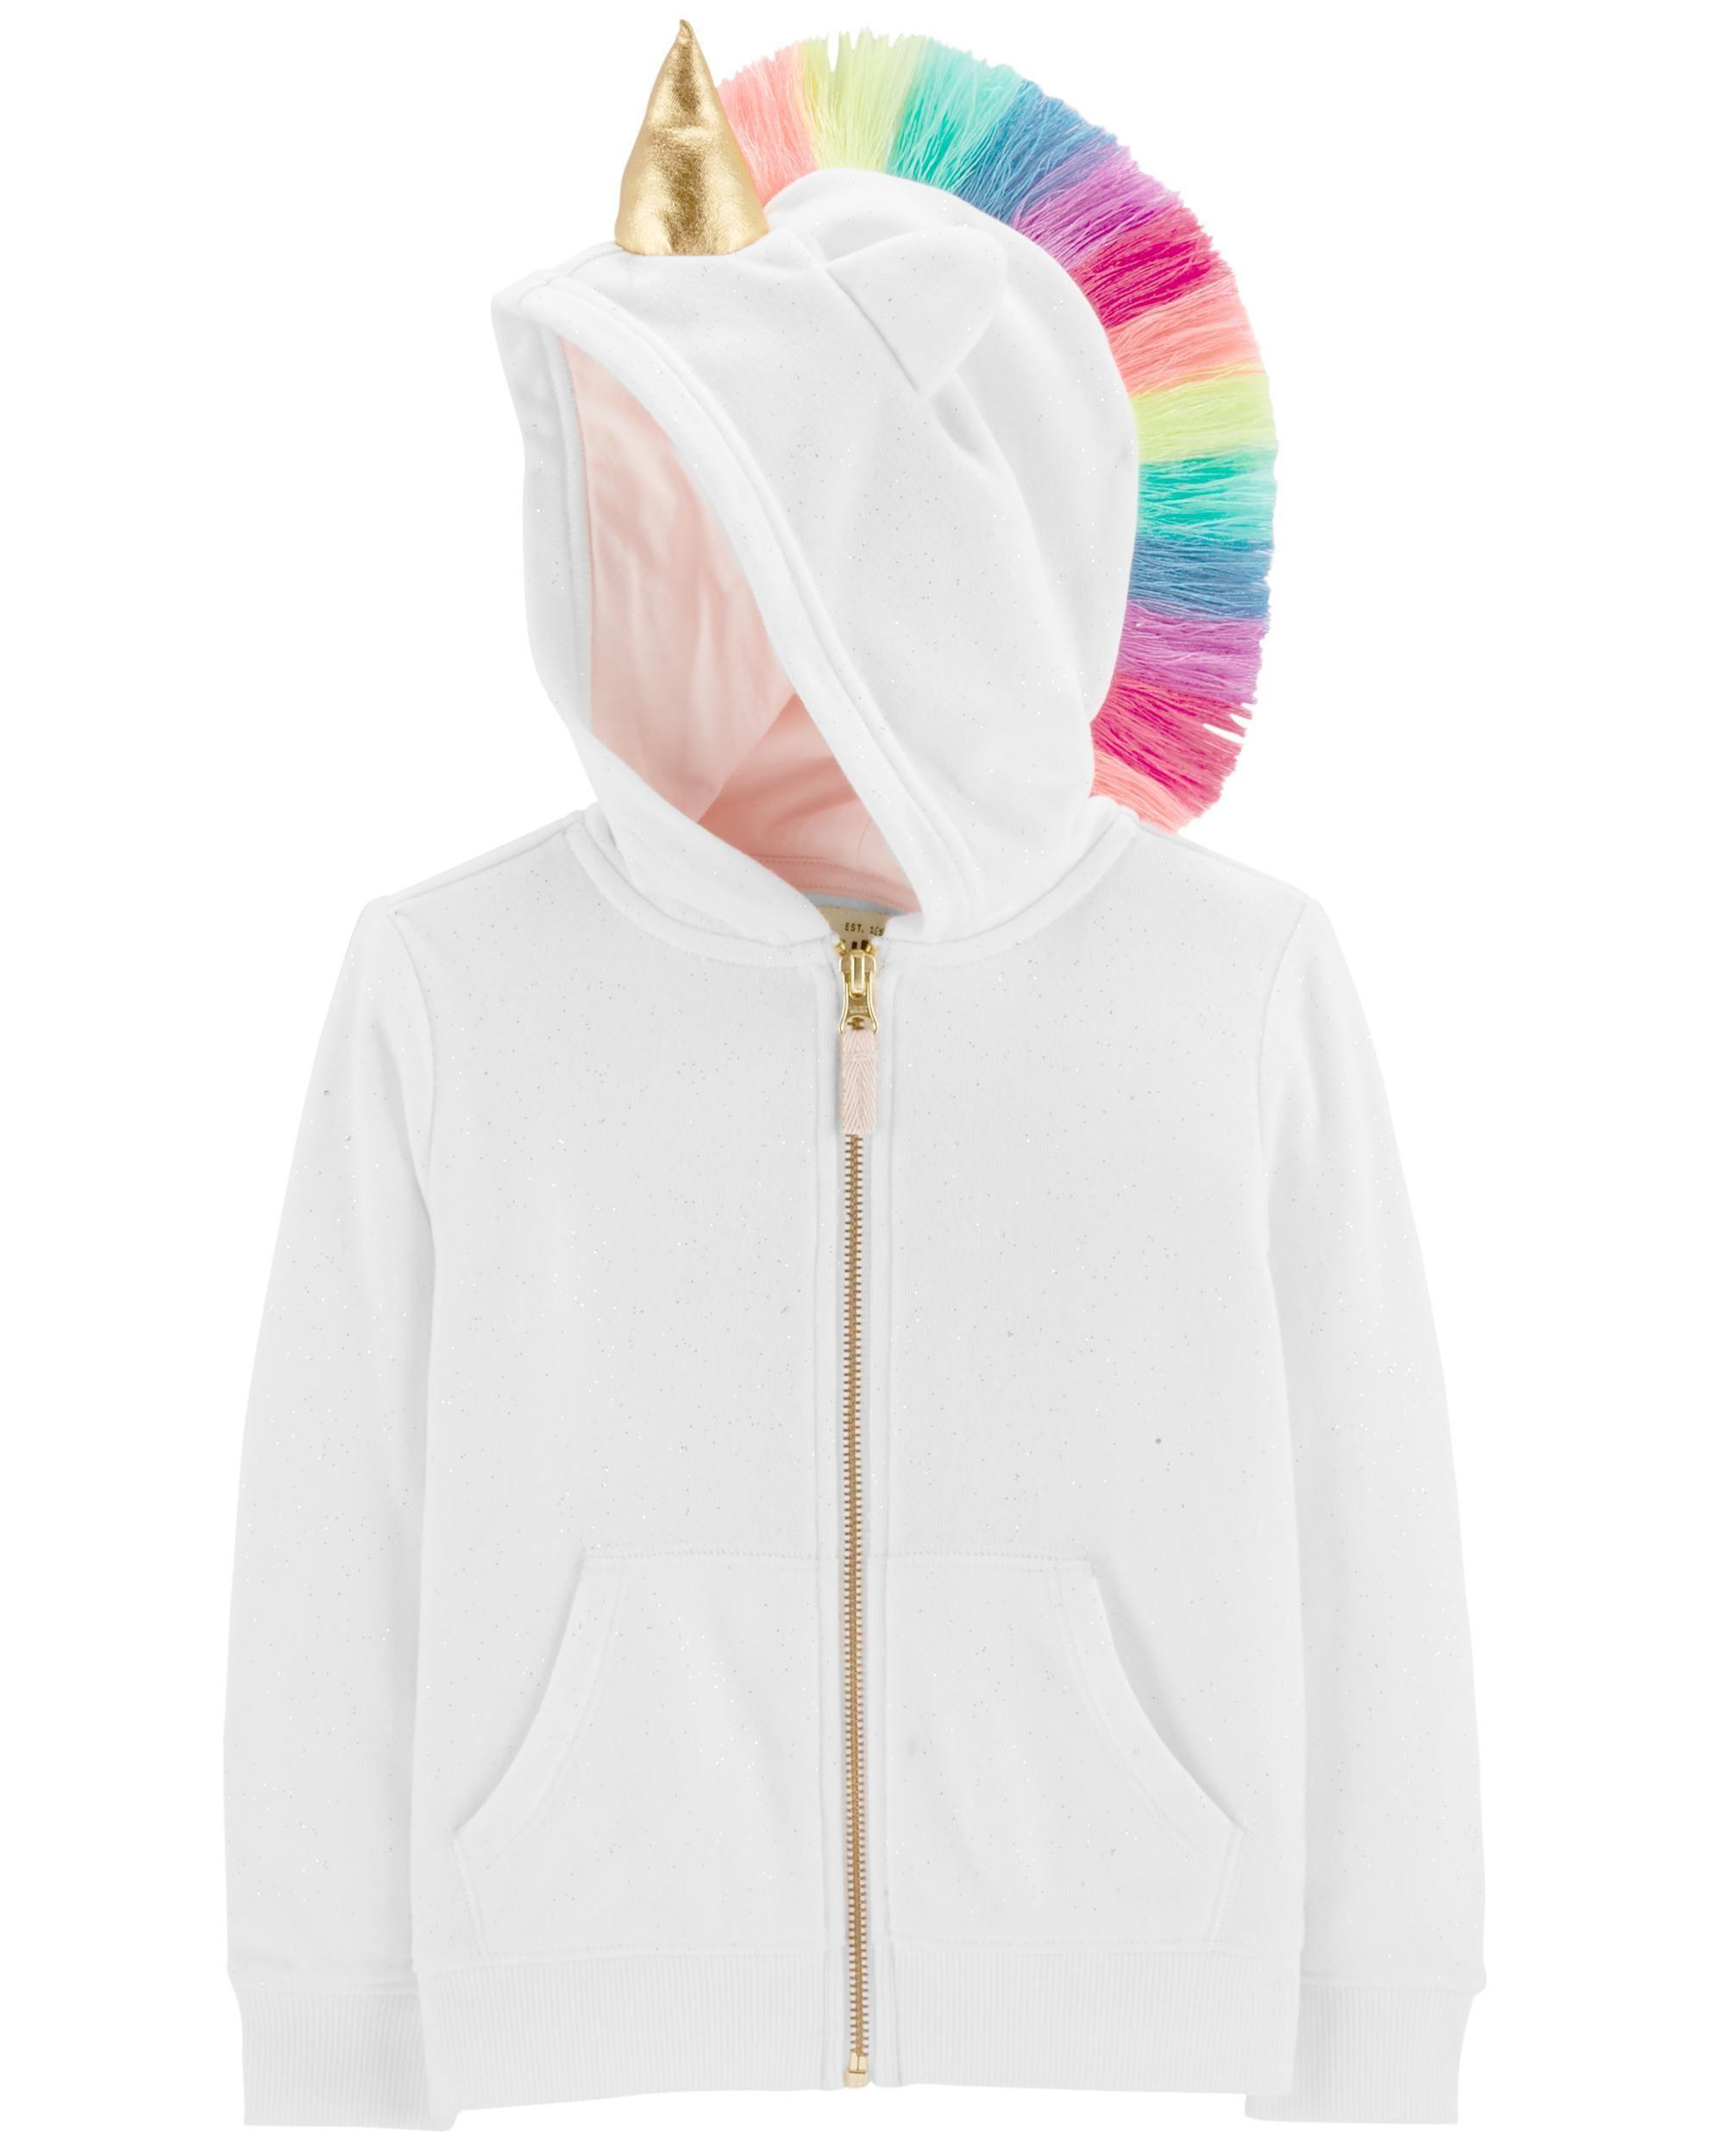 8cb9150c02aed Unicorn Glitter Hoodie   My Sweet Girl, O   Kids outfits, Fall baby ...